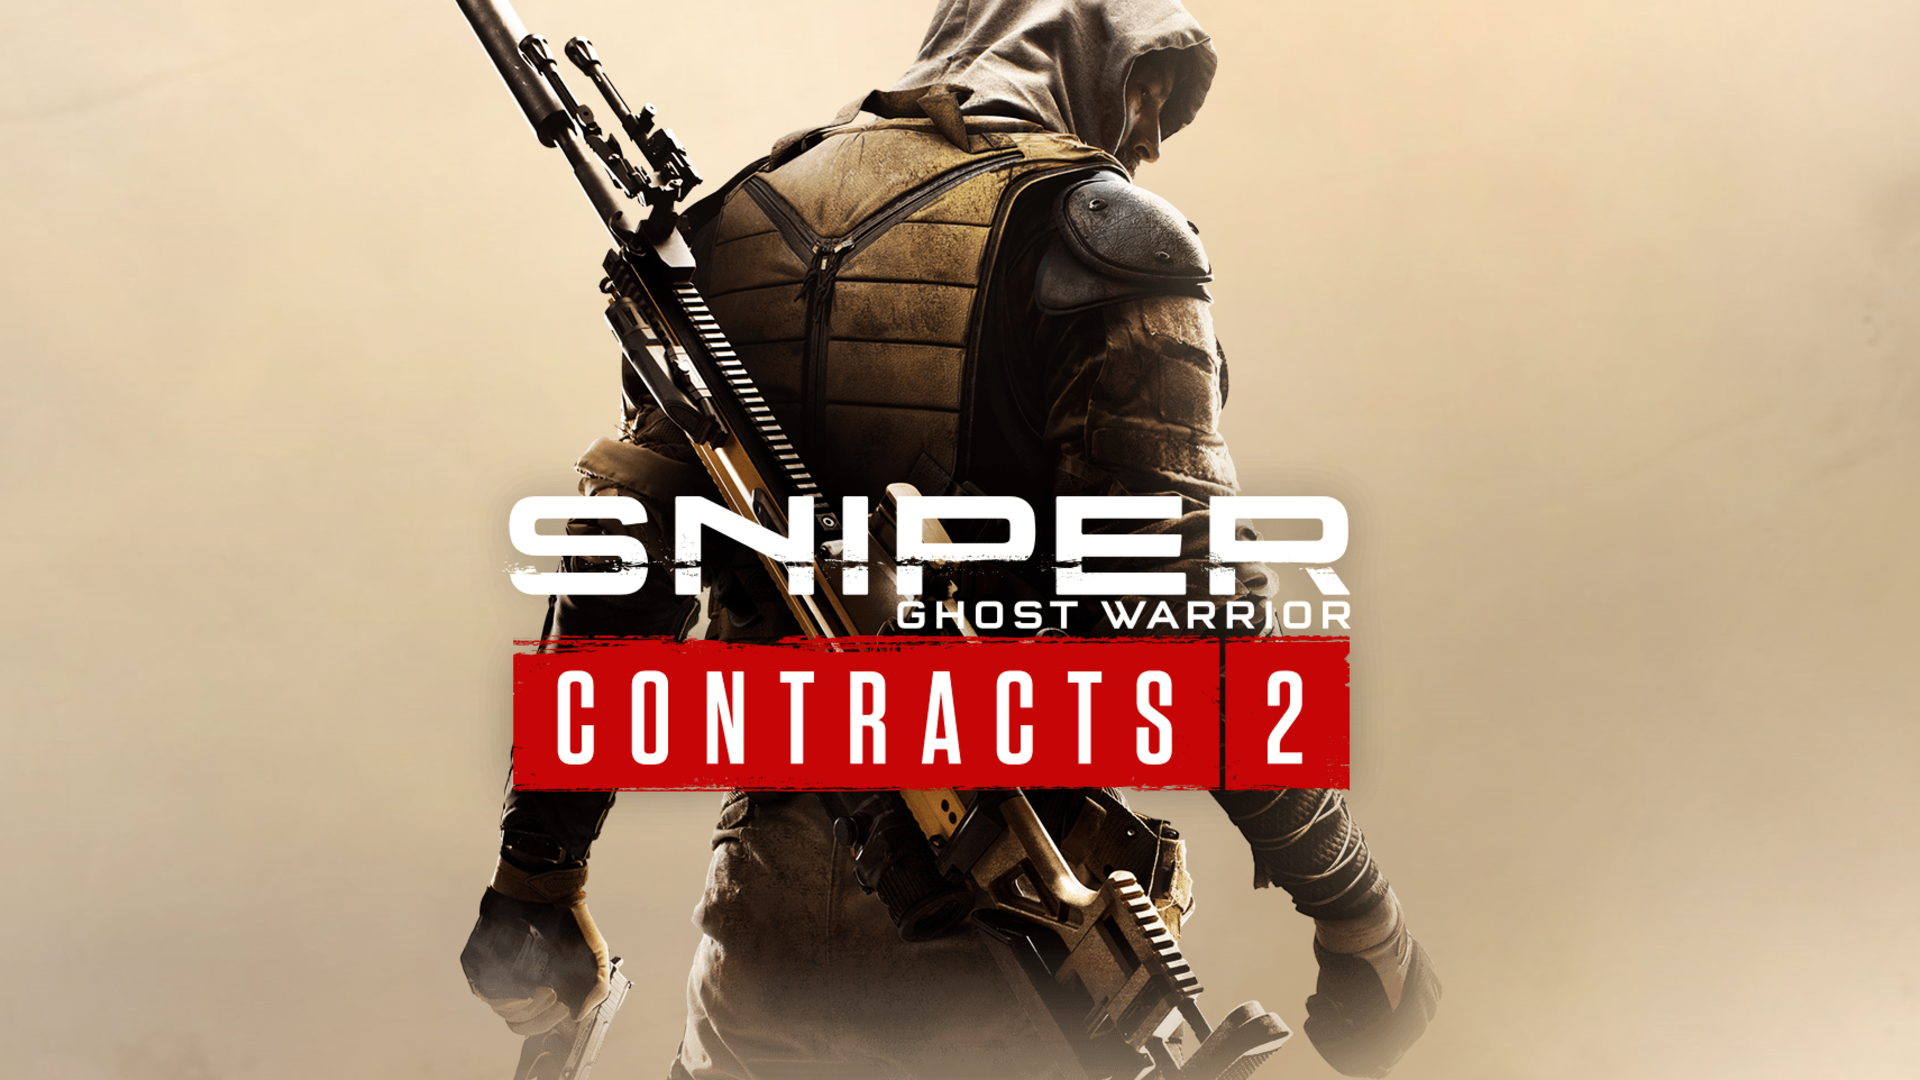 sniper-ghost-warrior-contracts-2-justforgames